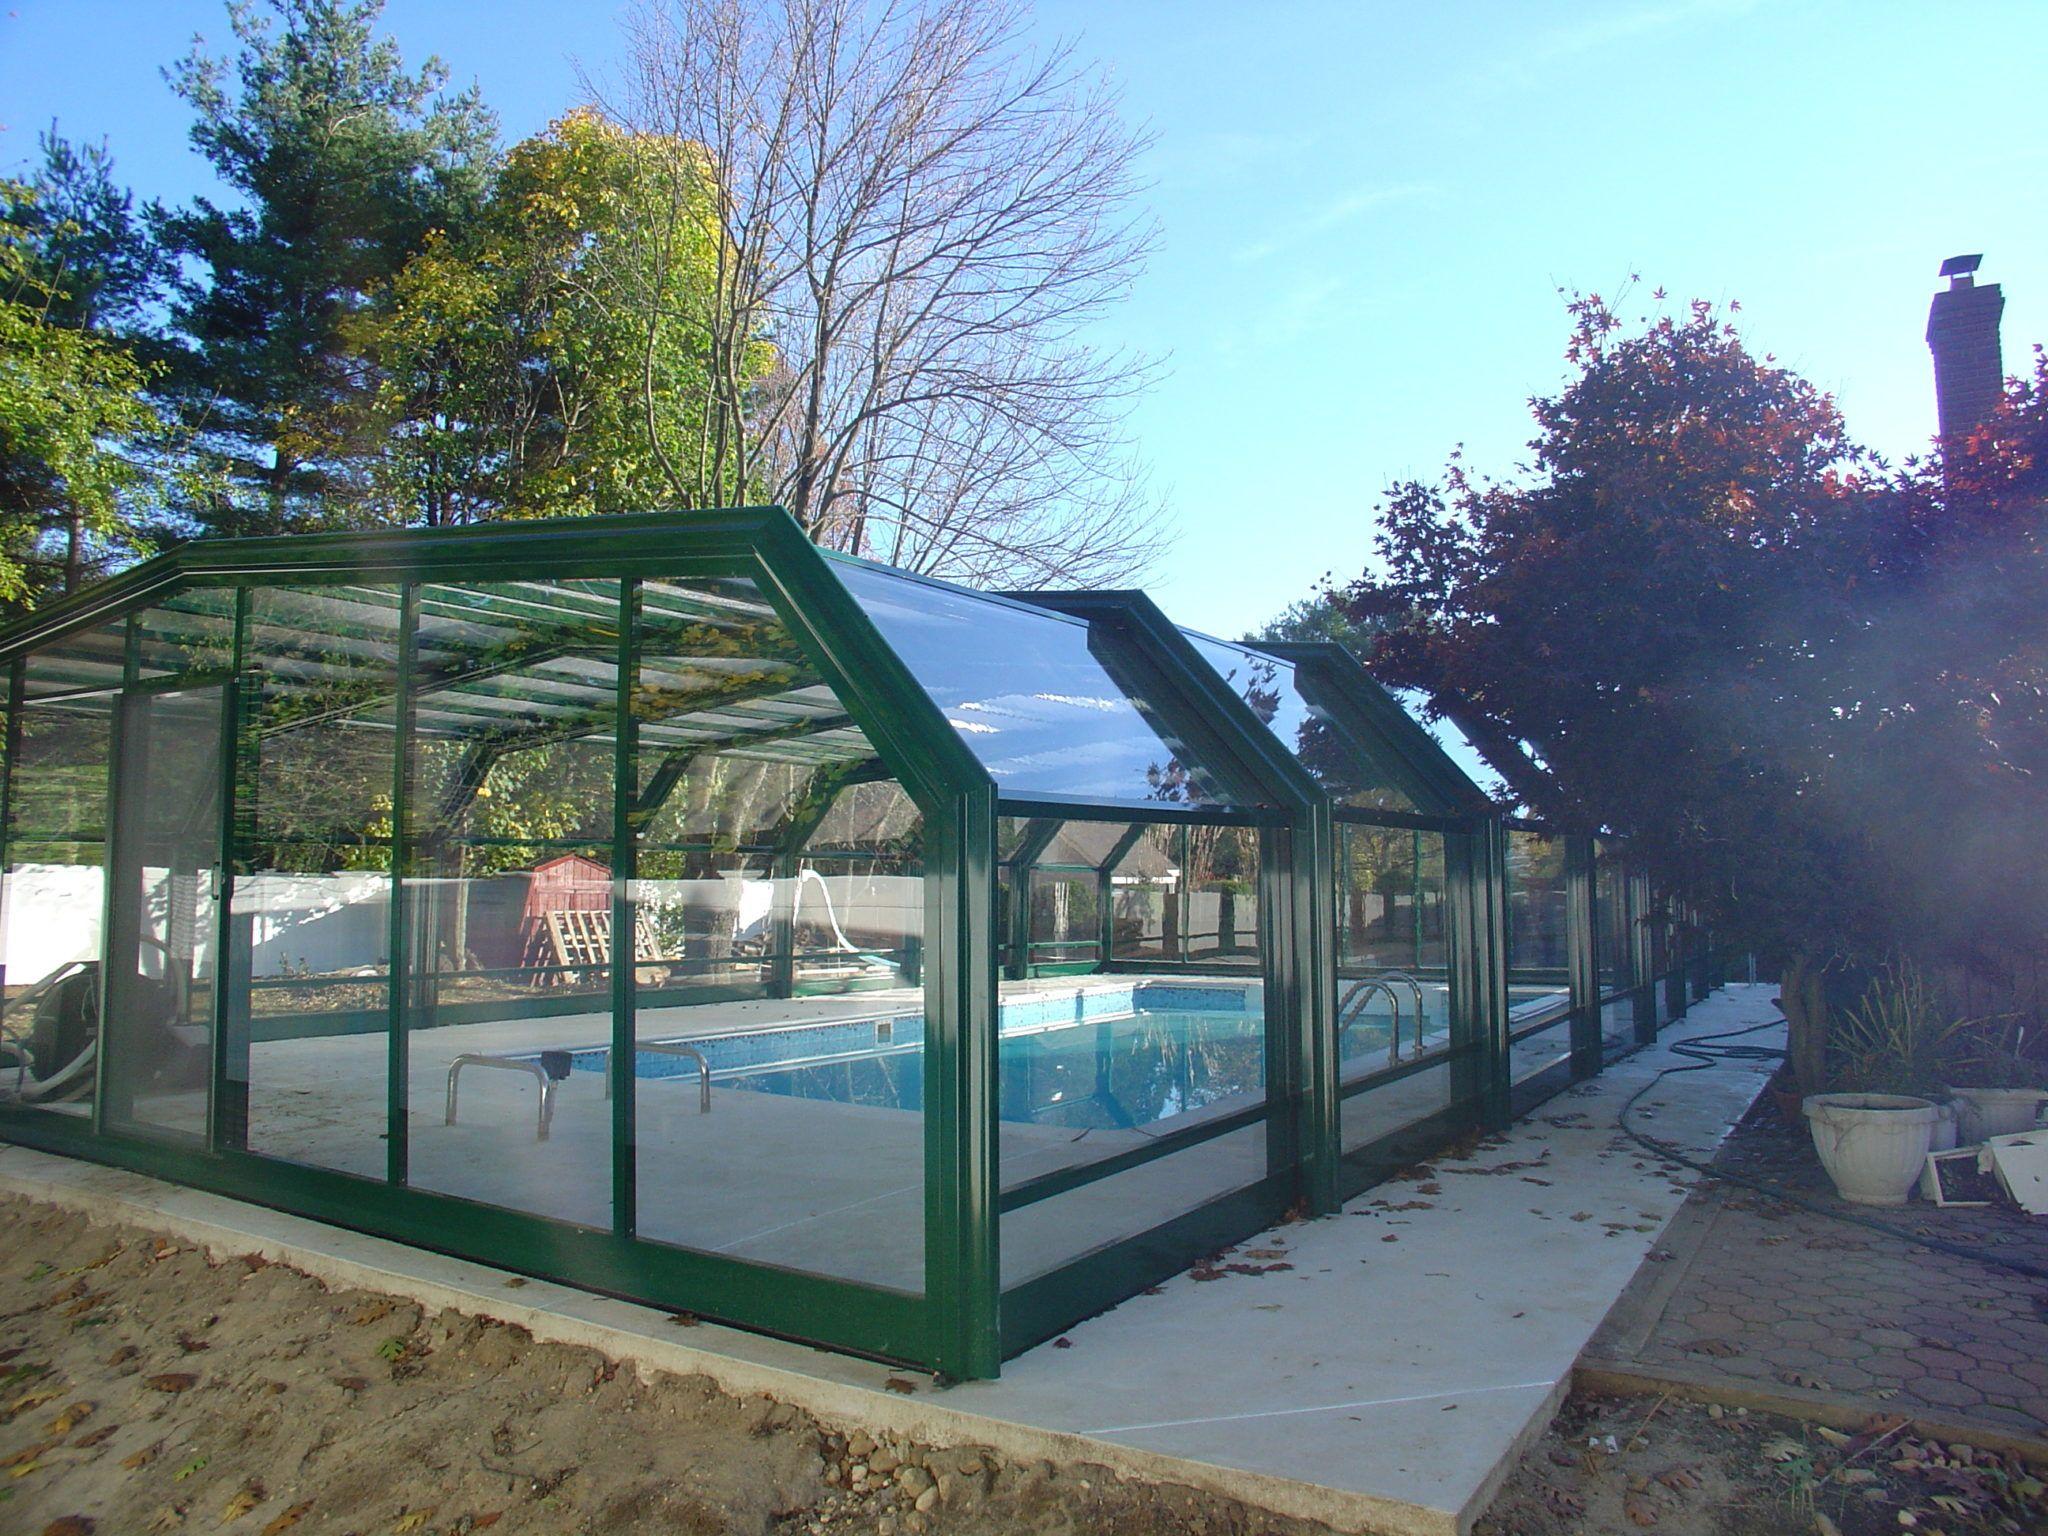 New Jersey Swimming Pool Enclosure Manufactured By Roll A Cover Swimming Pool Enclosures Pool Enclosures Swimming Pools